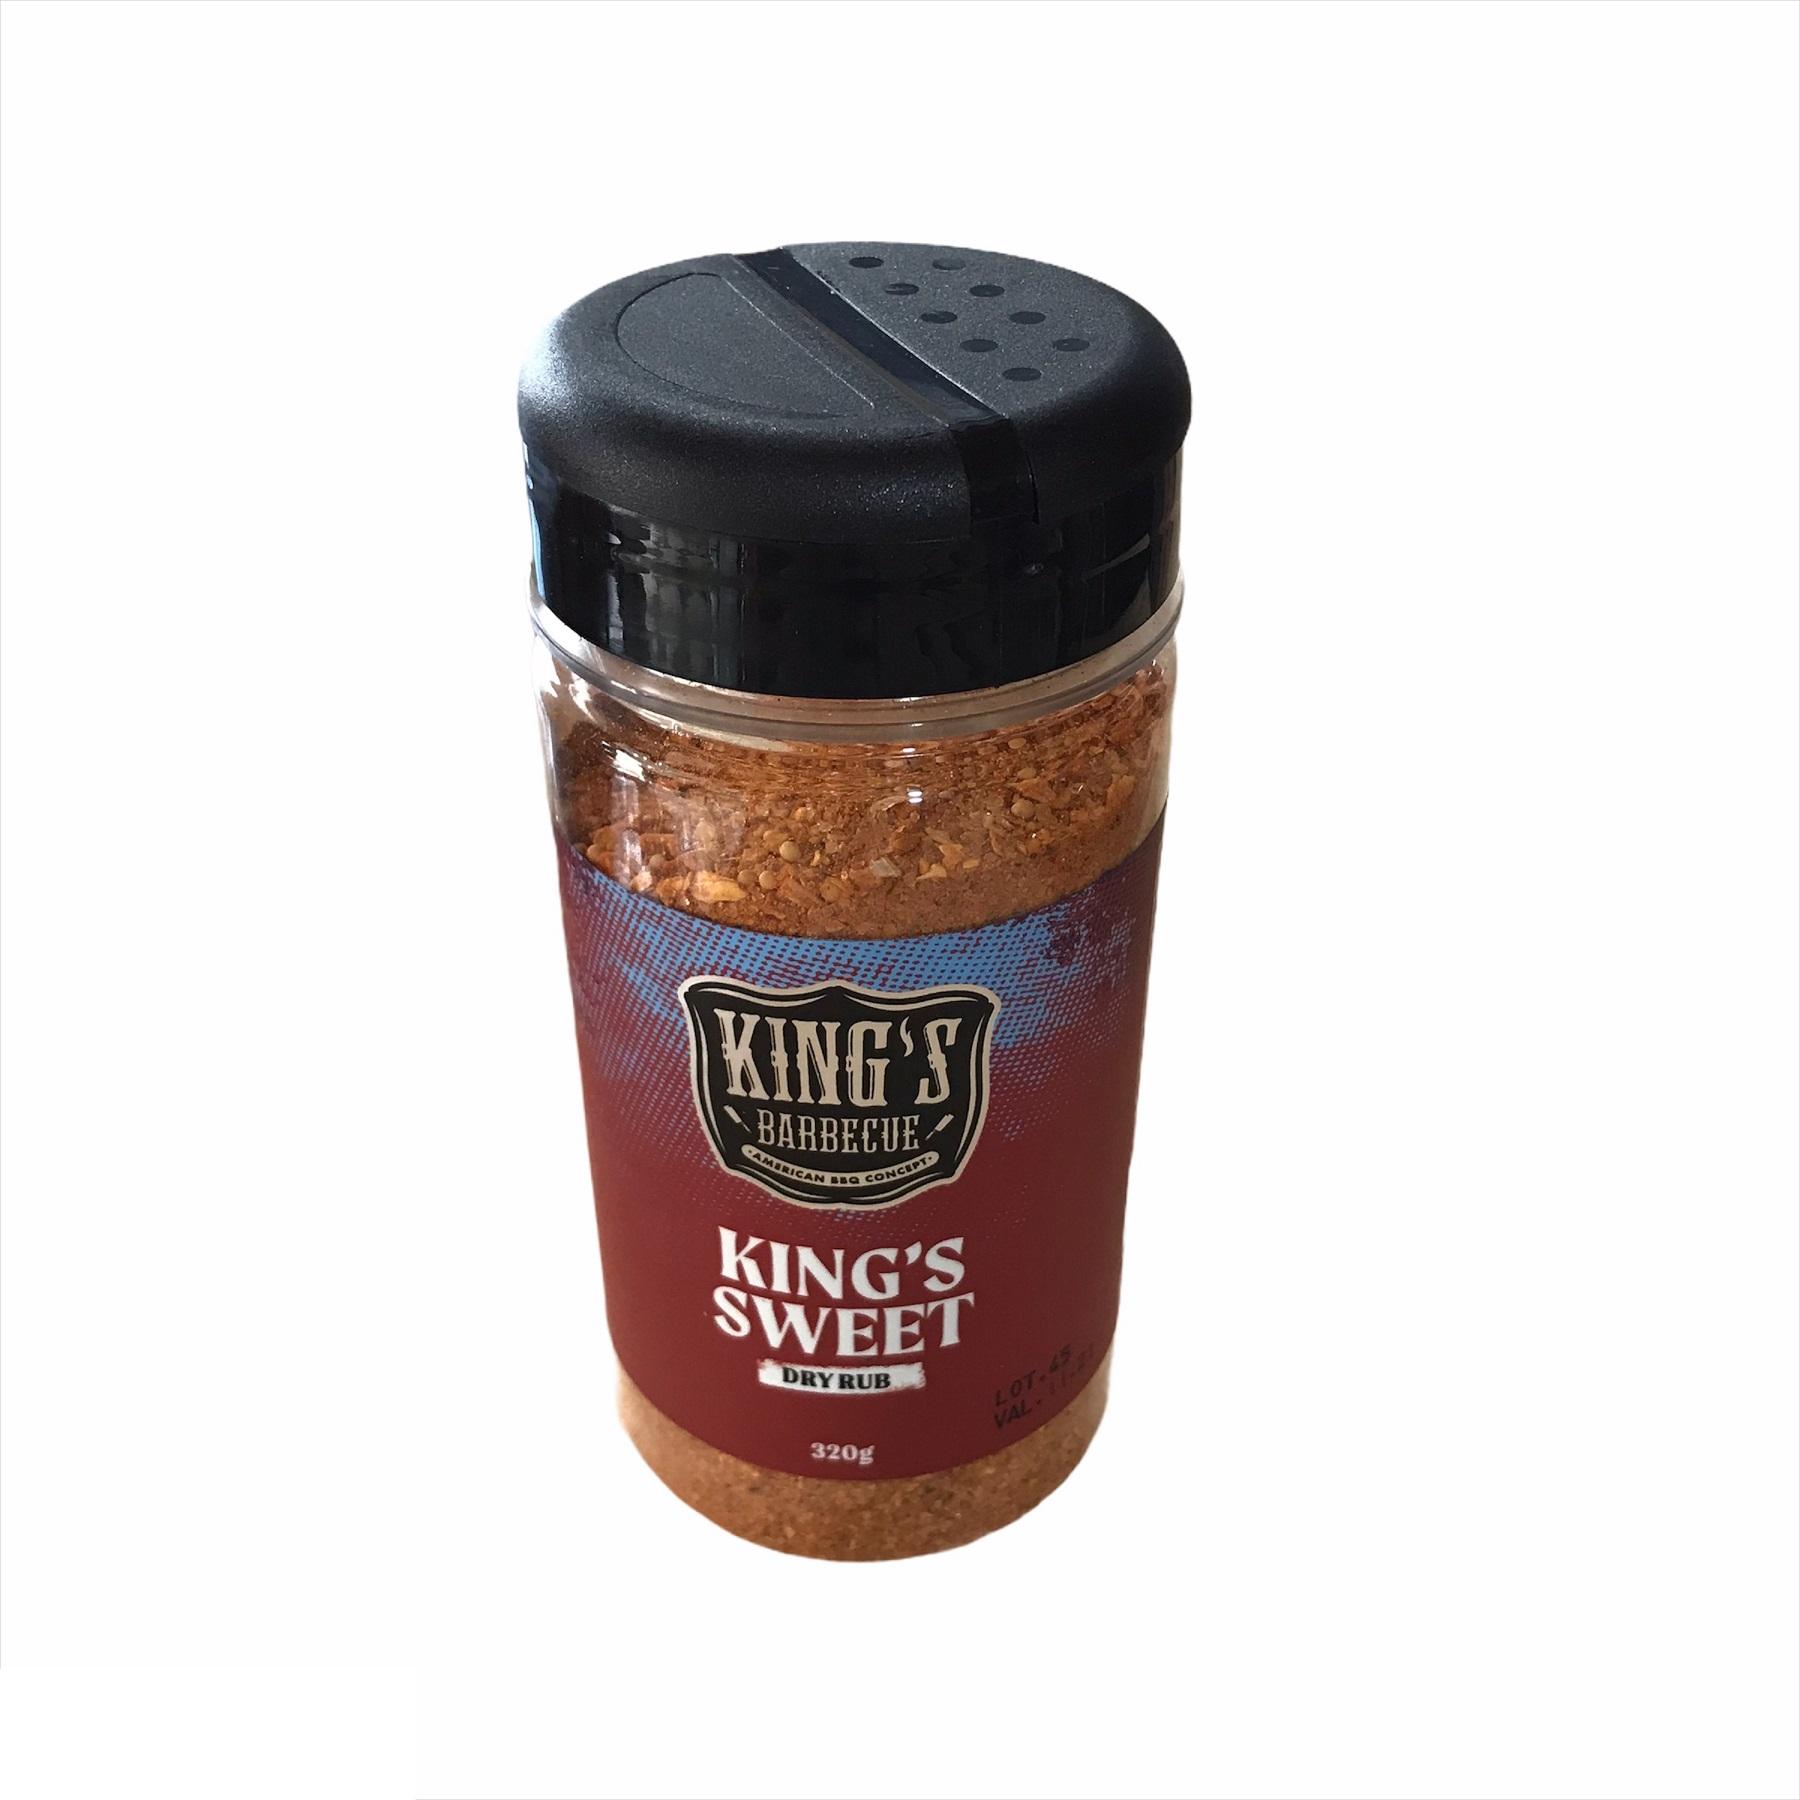 Dry Rub king's Sweet 320 gramas Kings Barbecue